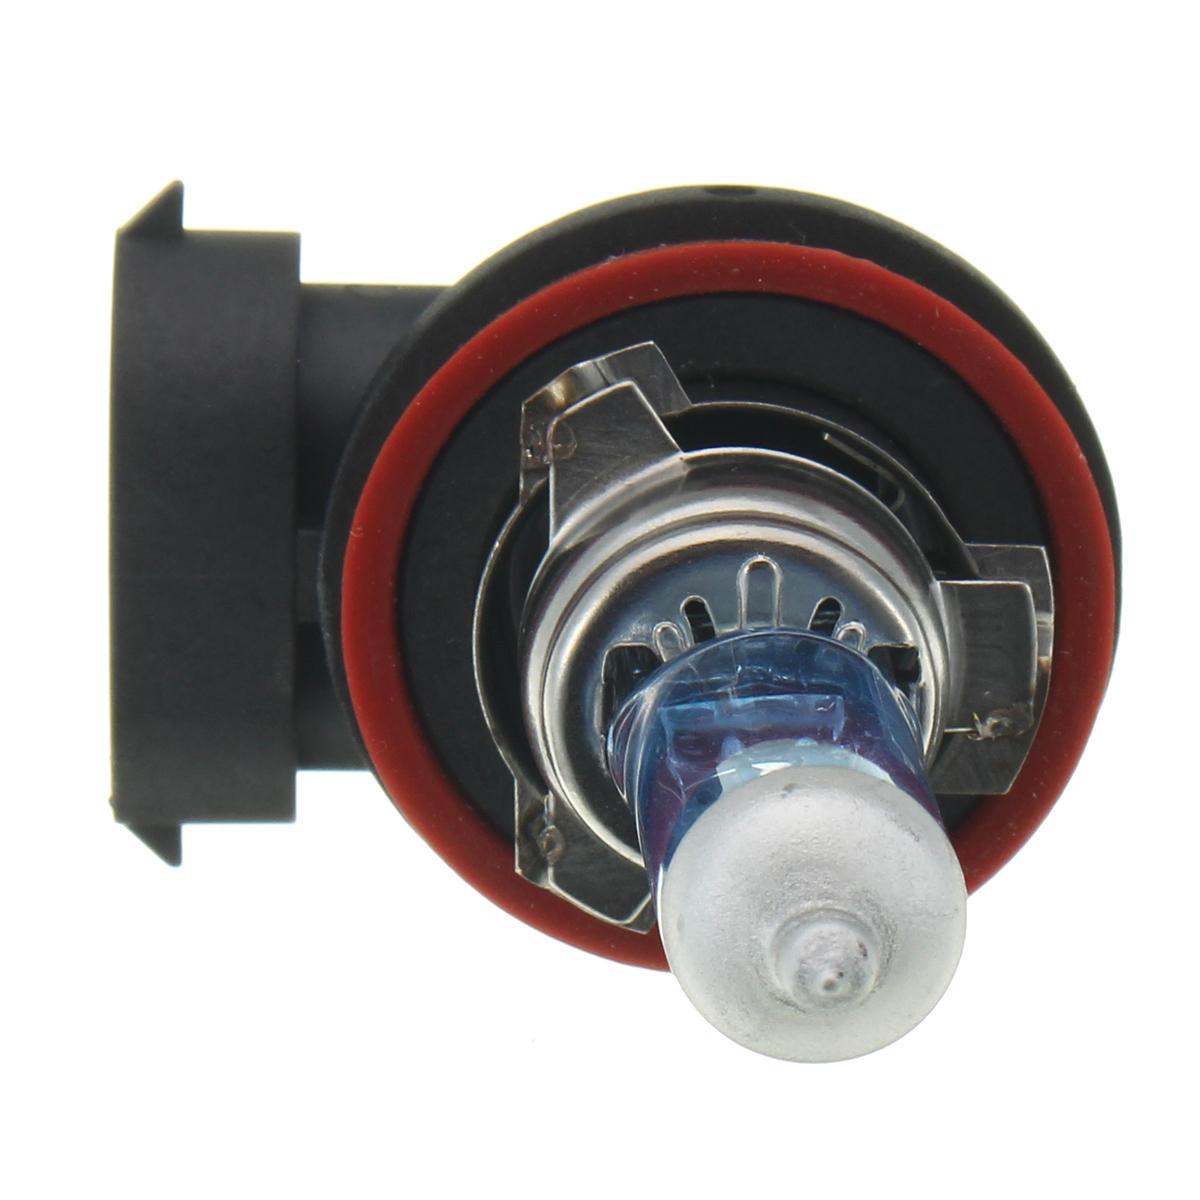 Super Bright H11/H8 35W 55W 12V 4500K White Car Halogen Headlights Fog Lights Bulbs - 6